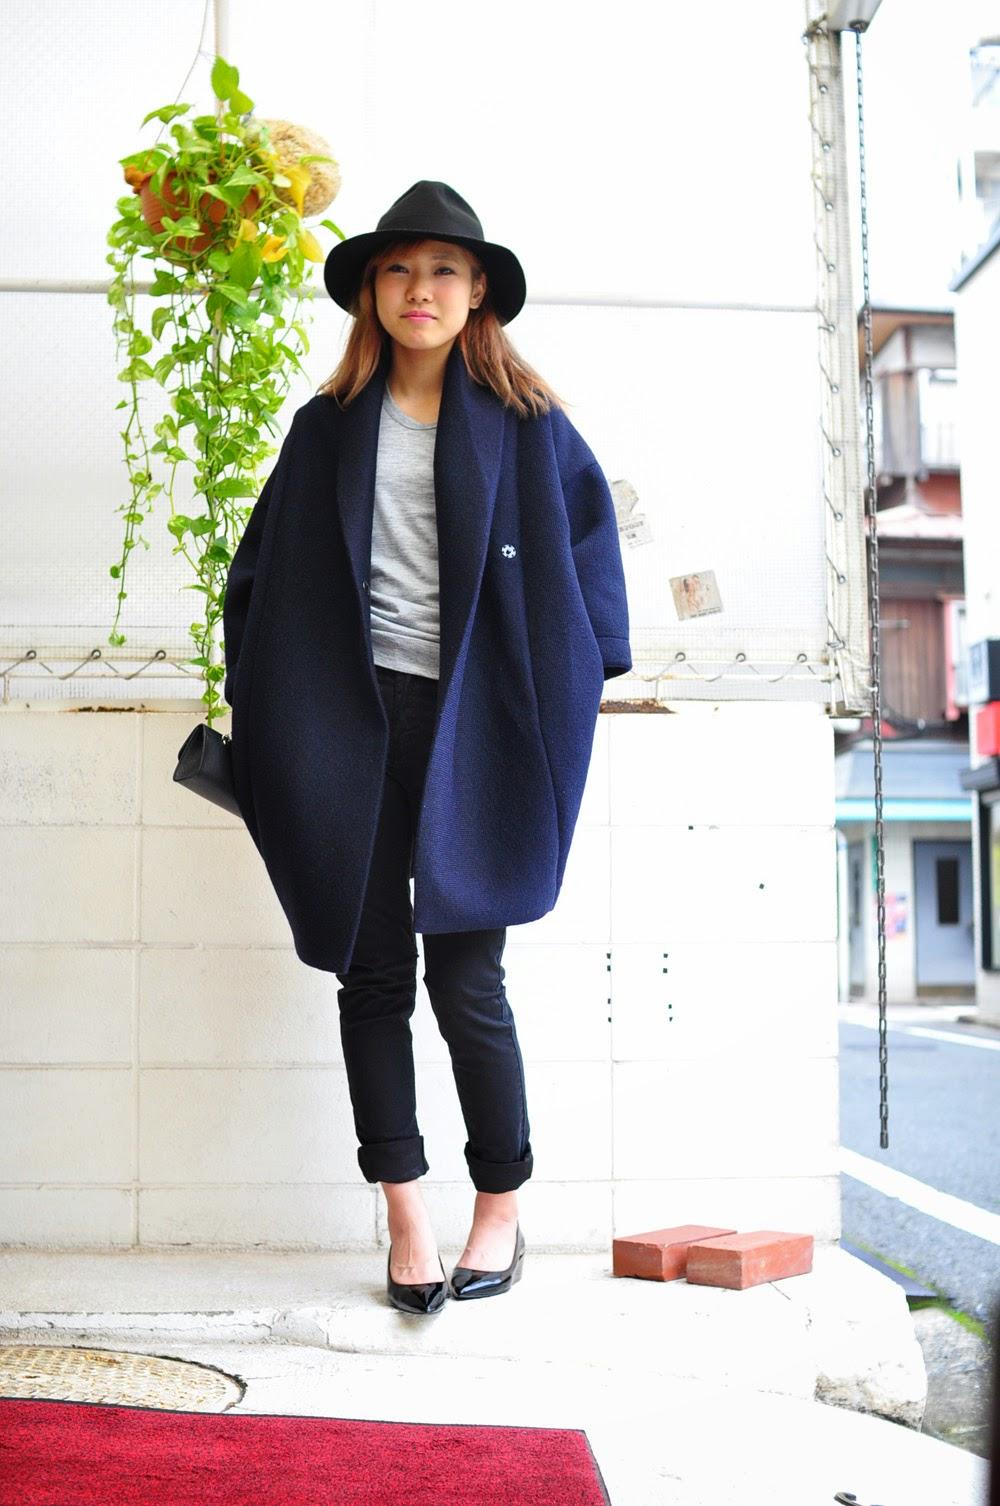 Reality Studio Xiong Coat Reality Studio / Xiong Coat